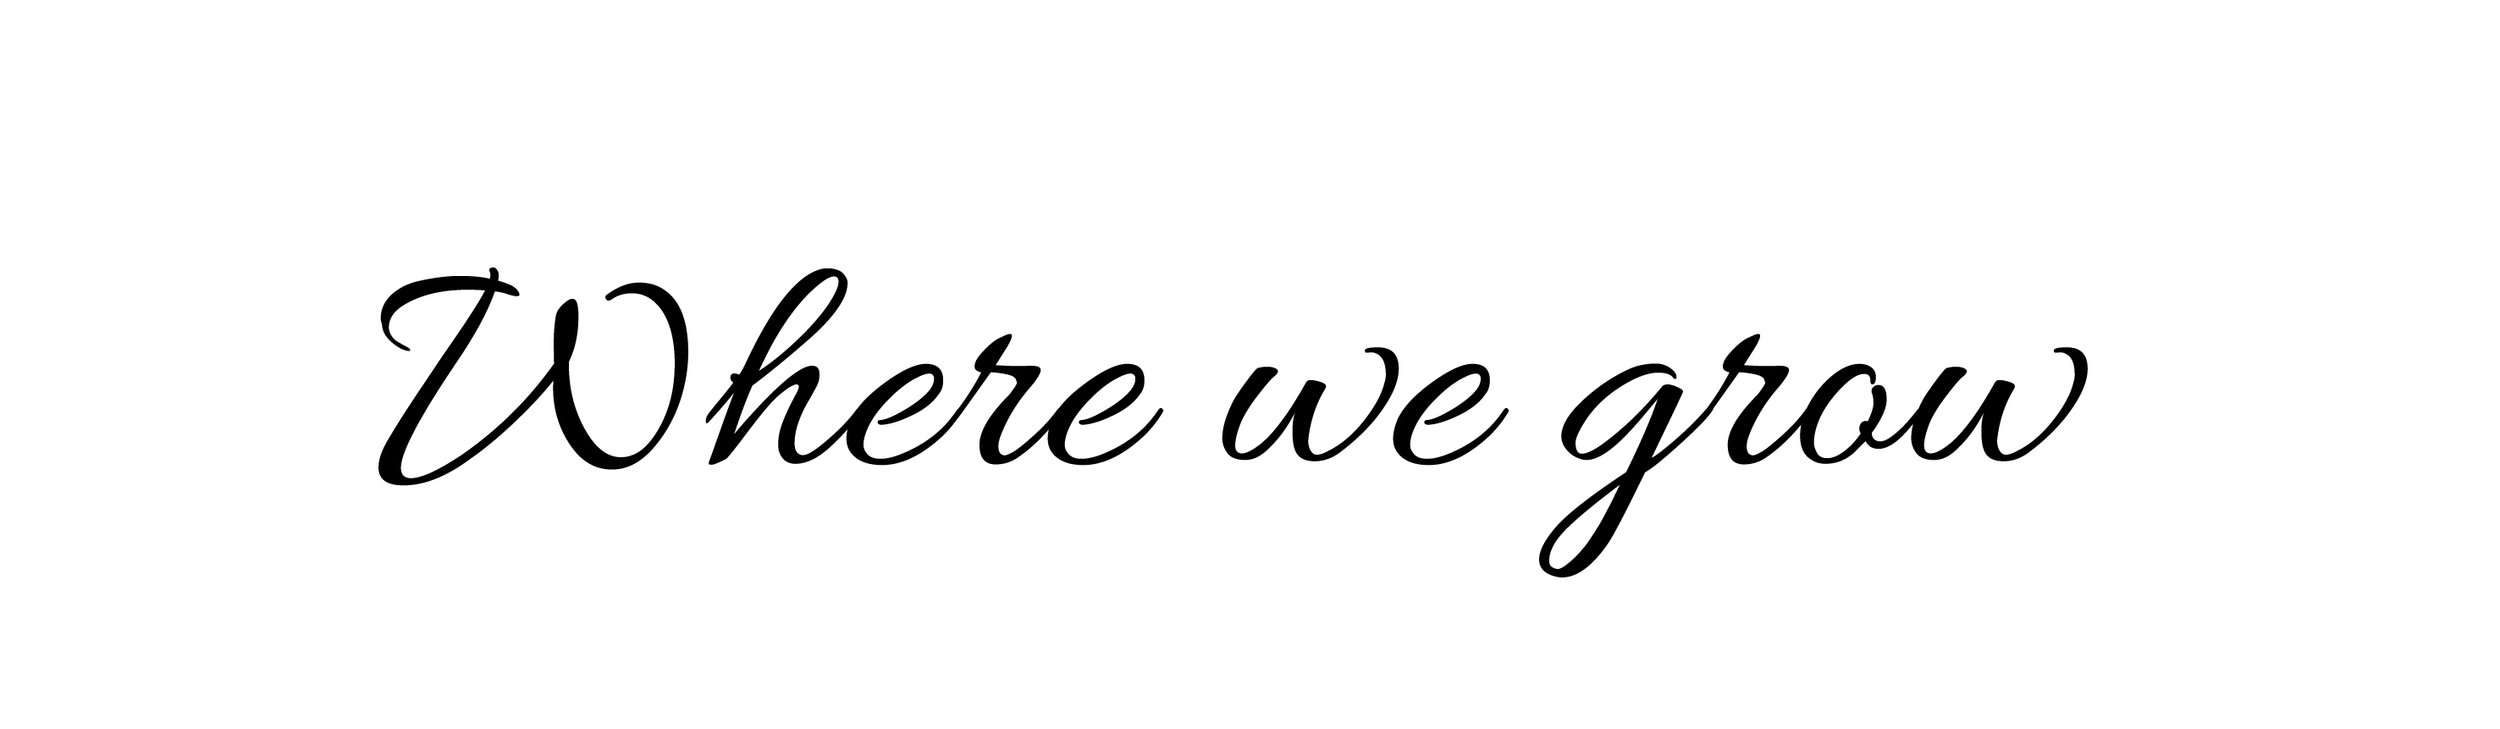 Where_we_grow.jpg